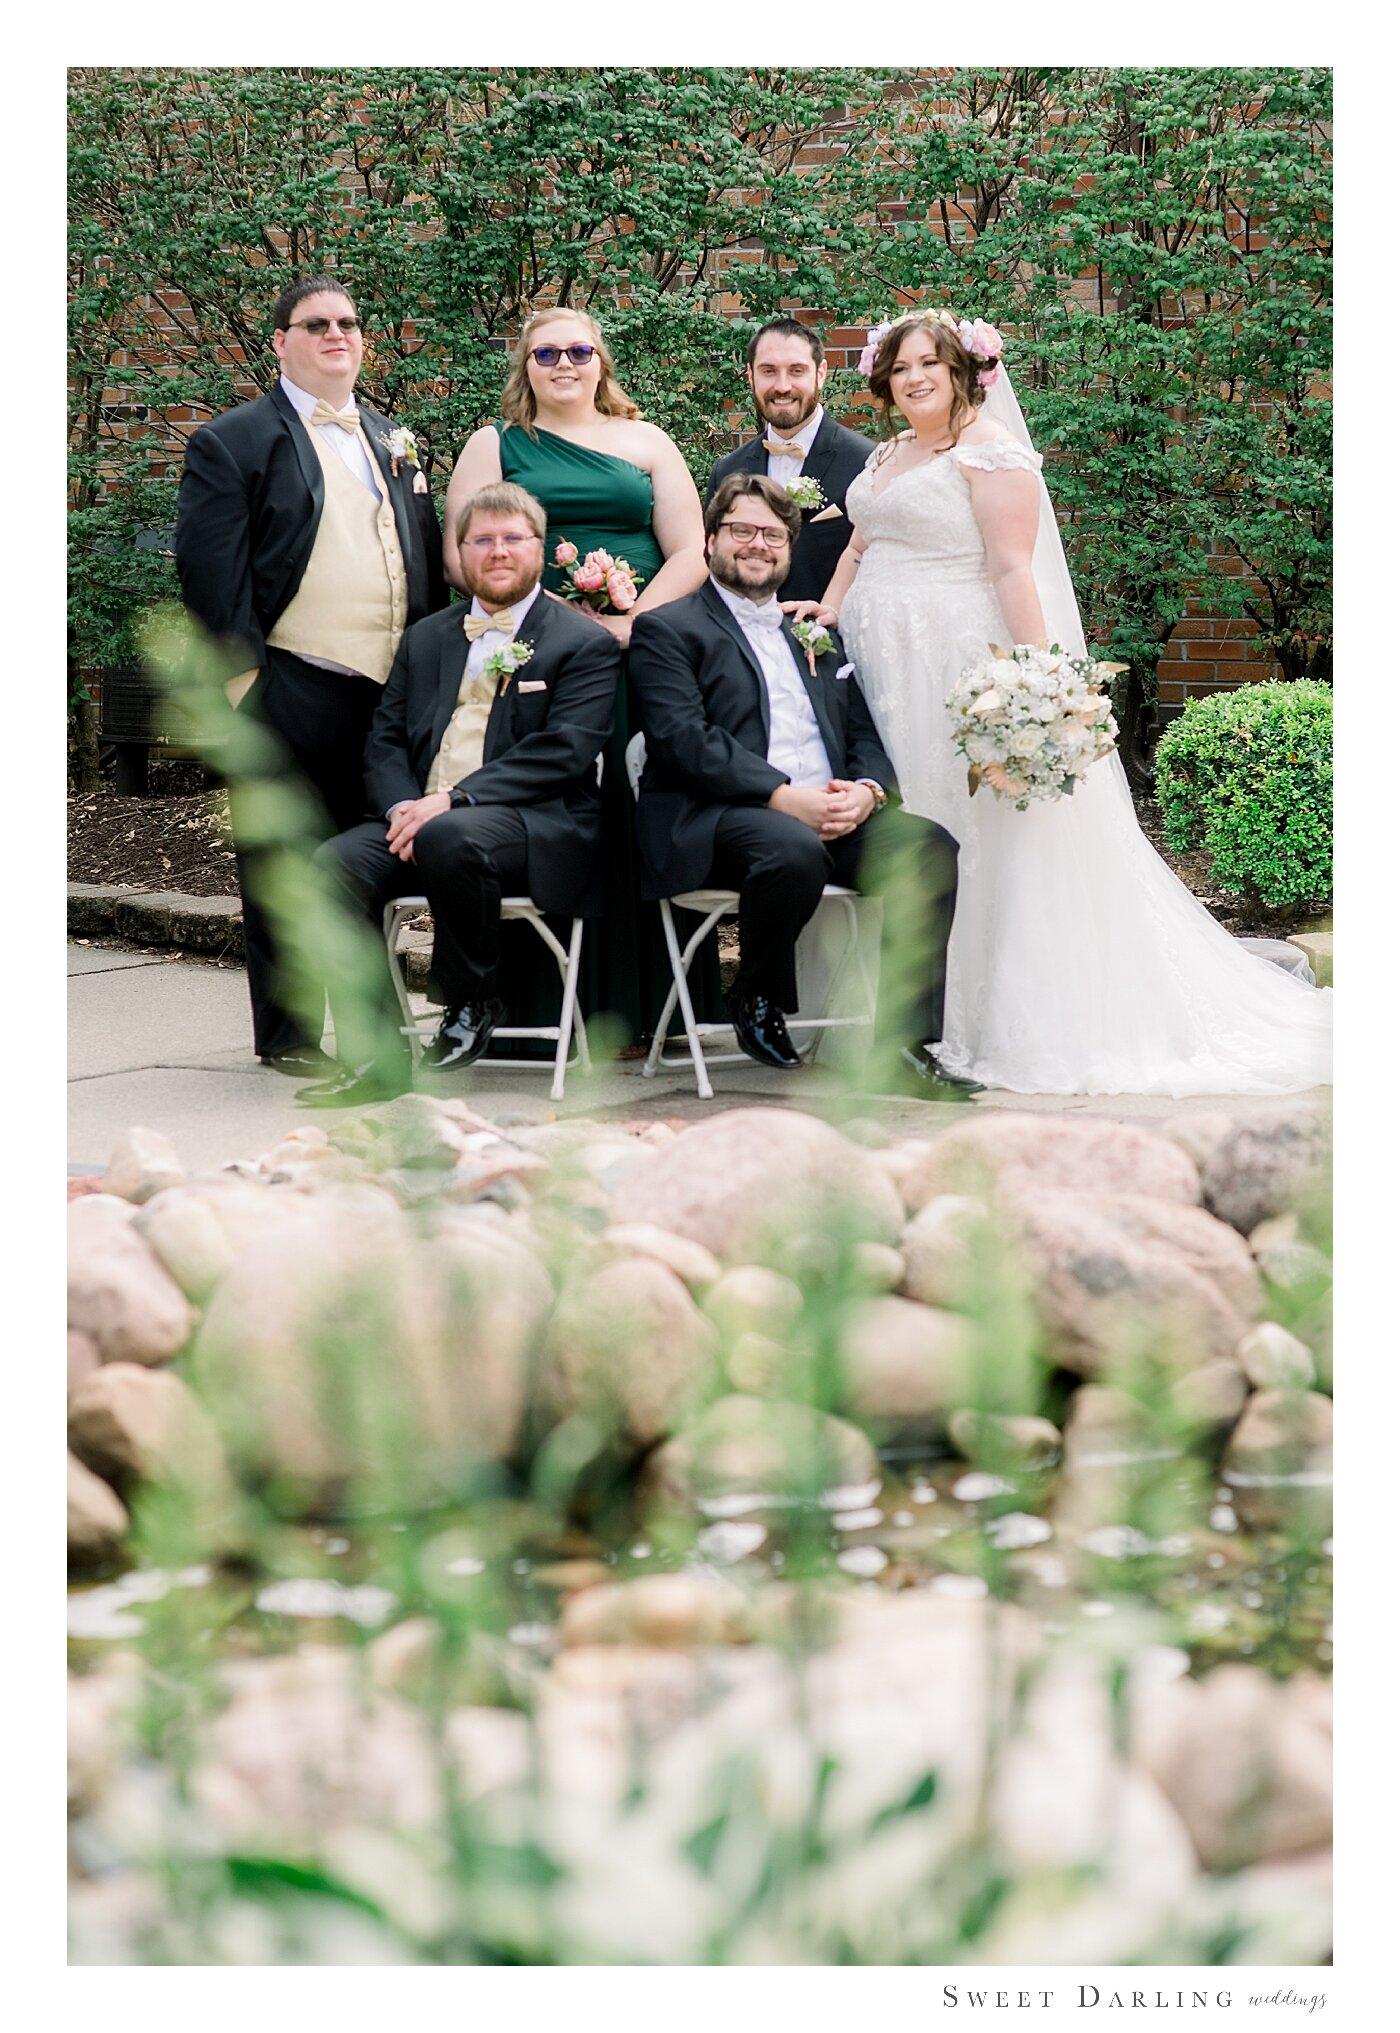 Bloomington-Normal-IL-Wedding-Photographer-eastland-suites-hotel_0025.jpg